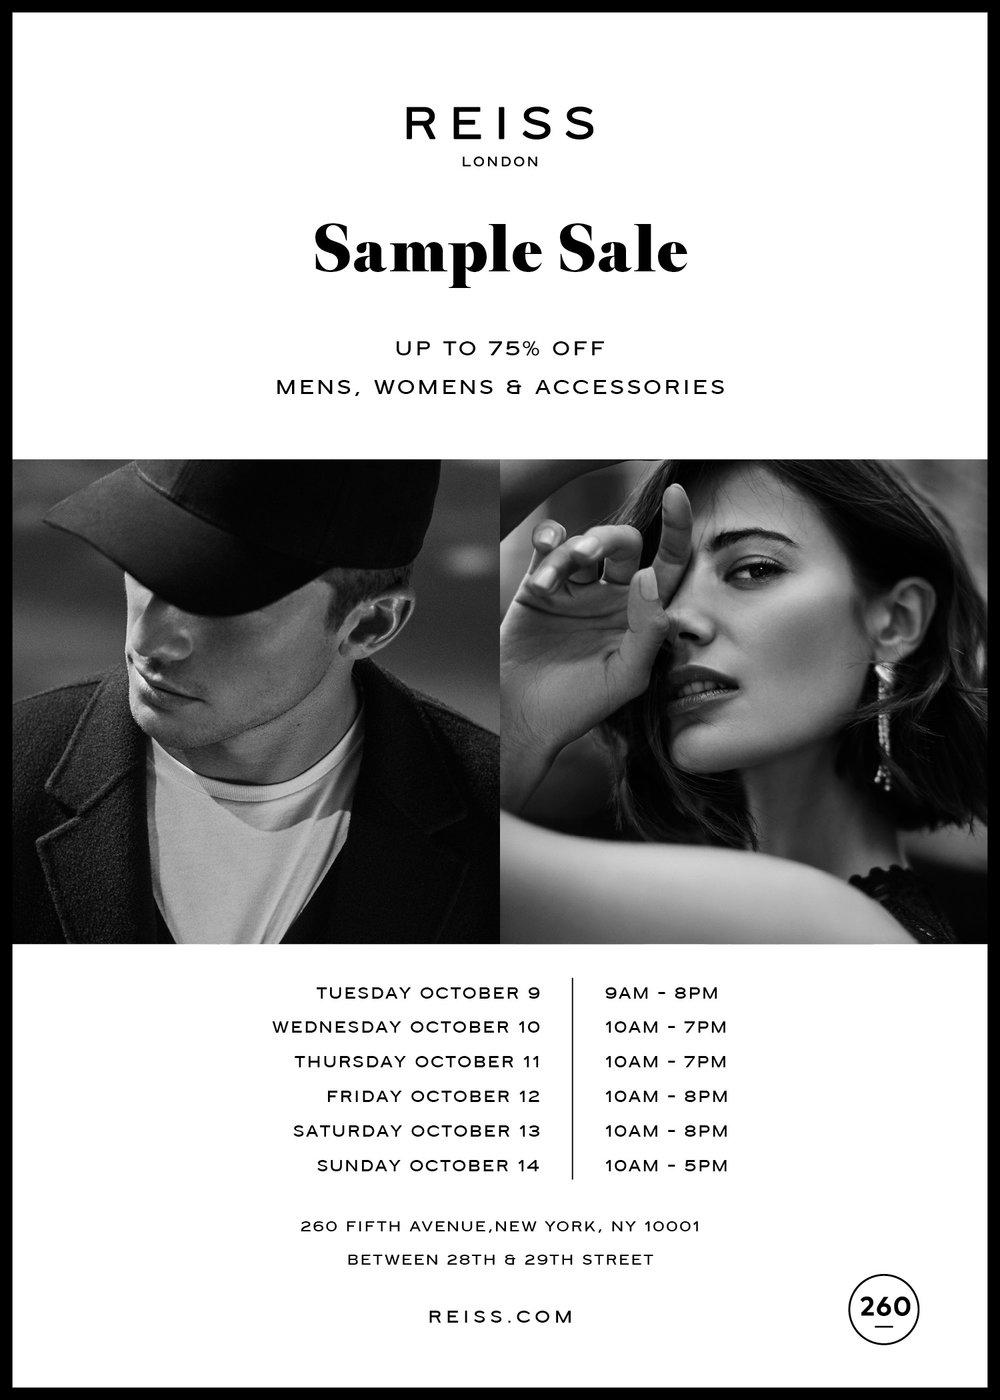 Reiss Sample Sale Digital Invite.jpg